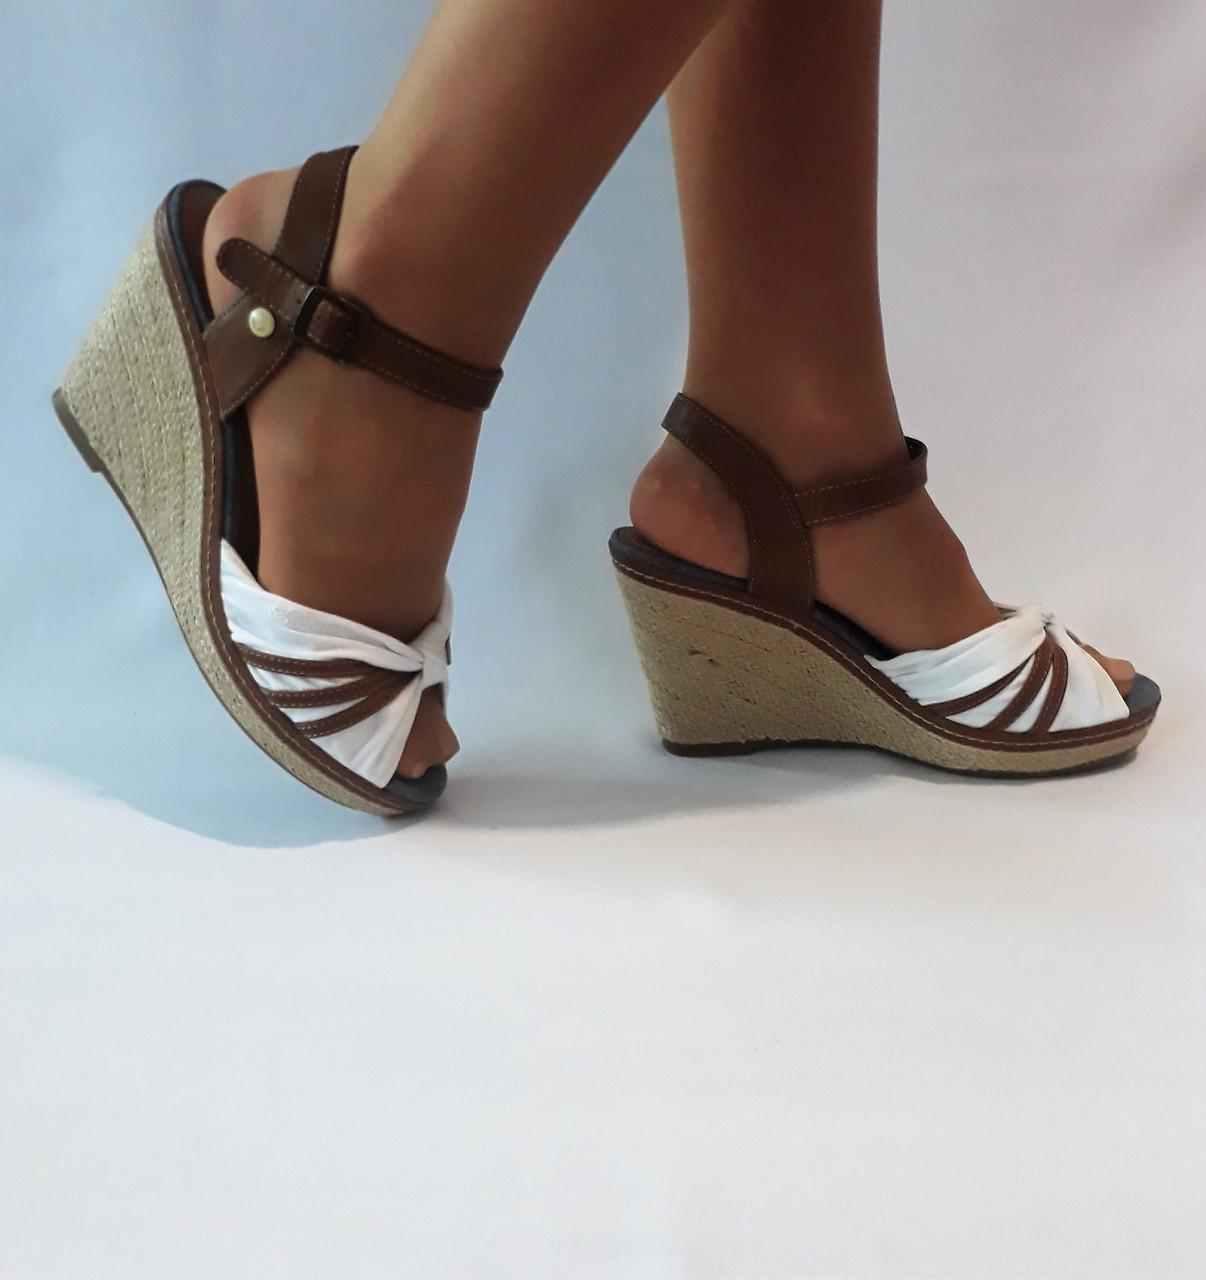 d07b057117ae Женские босоножки фирмы tom tailor(эспадрильи) Германия. - Интернет магазин  обуви MARKA-